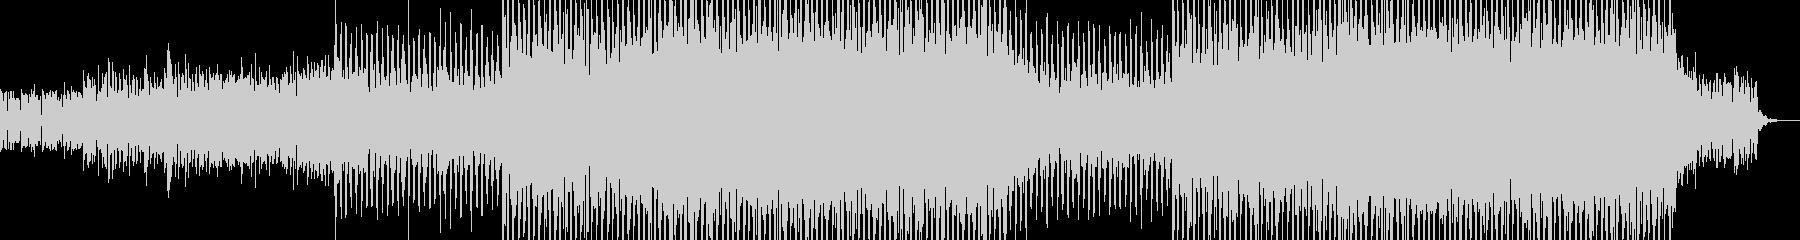 EDMポップで明るいクラブ系-19の未再生の波形